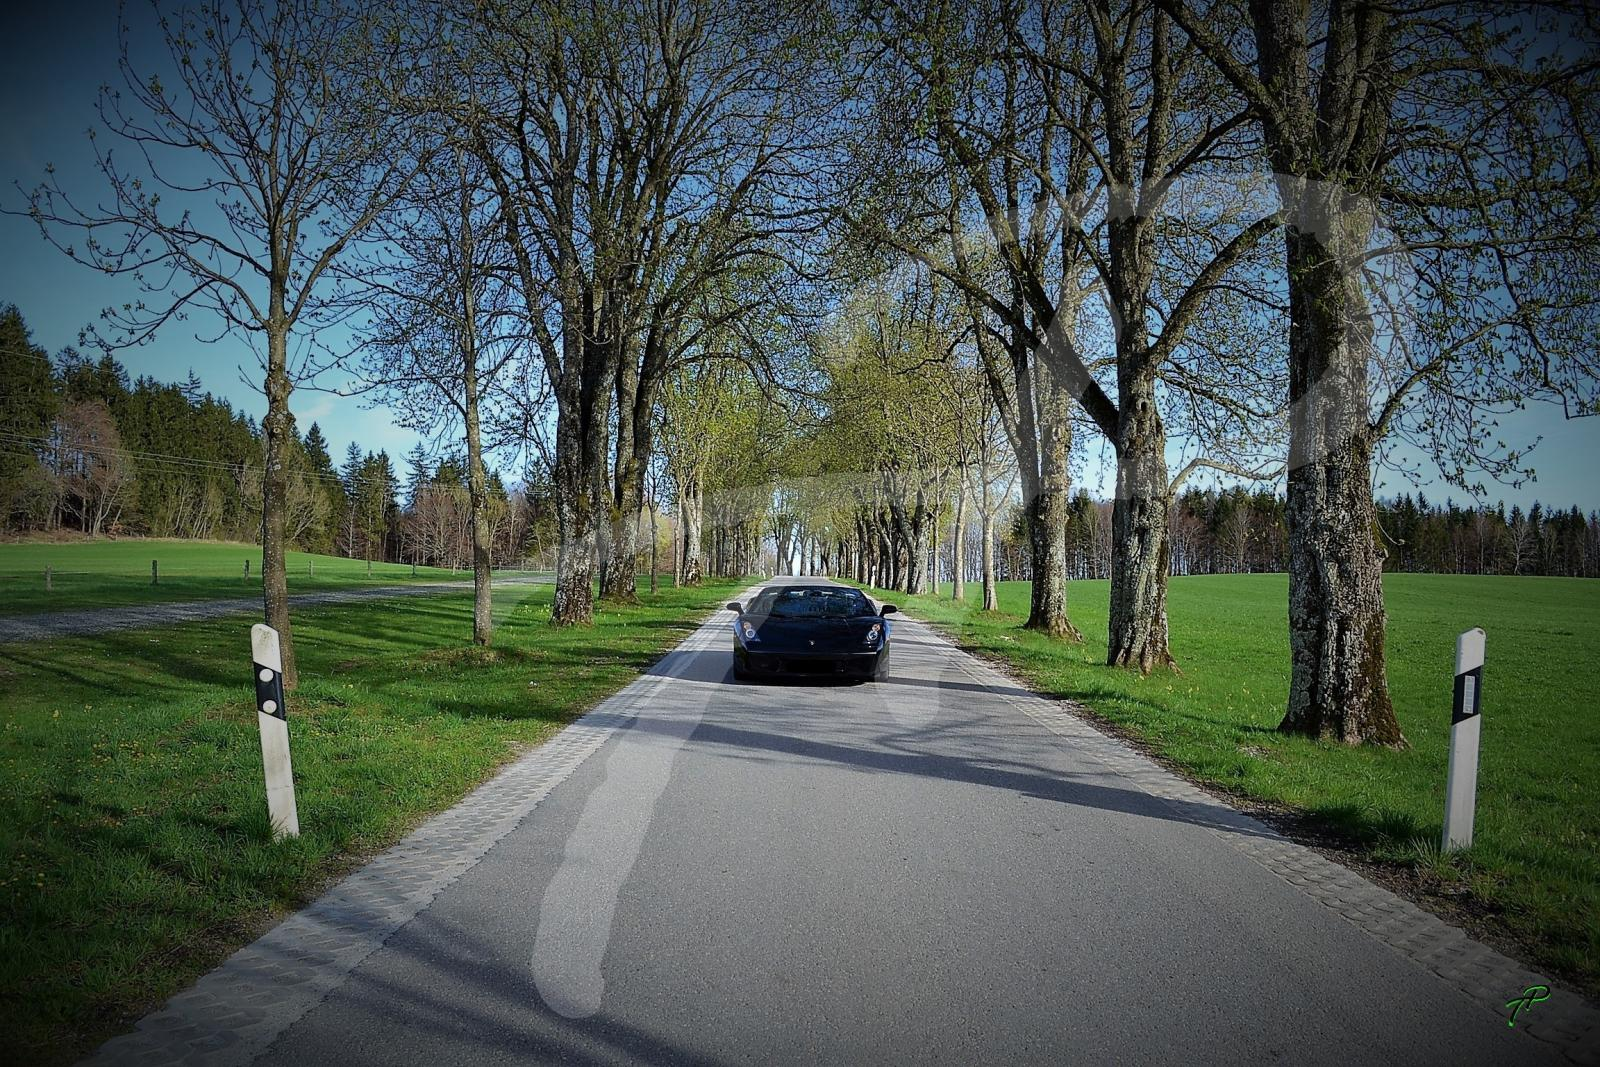 Lamborghini LP 520 Spyder